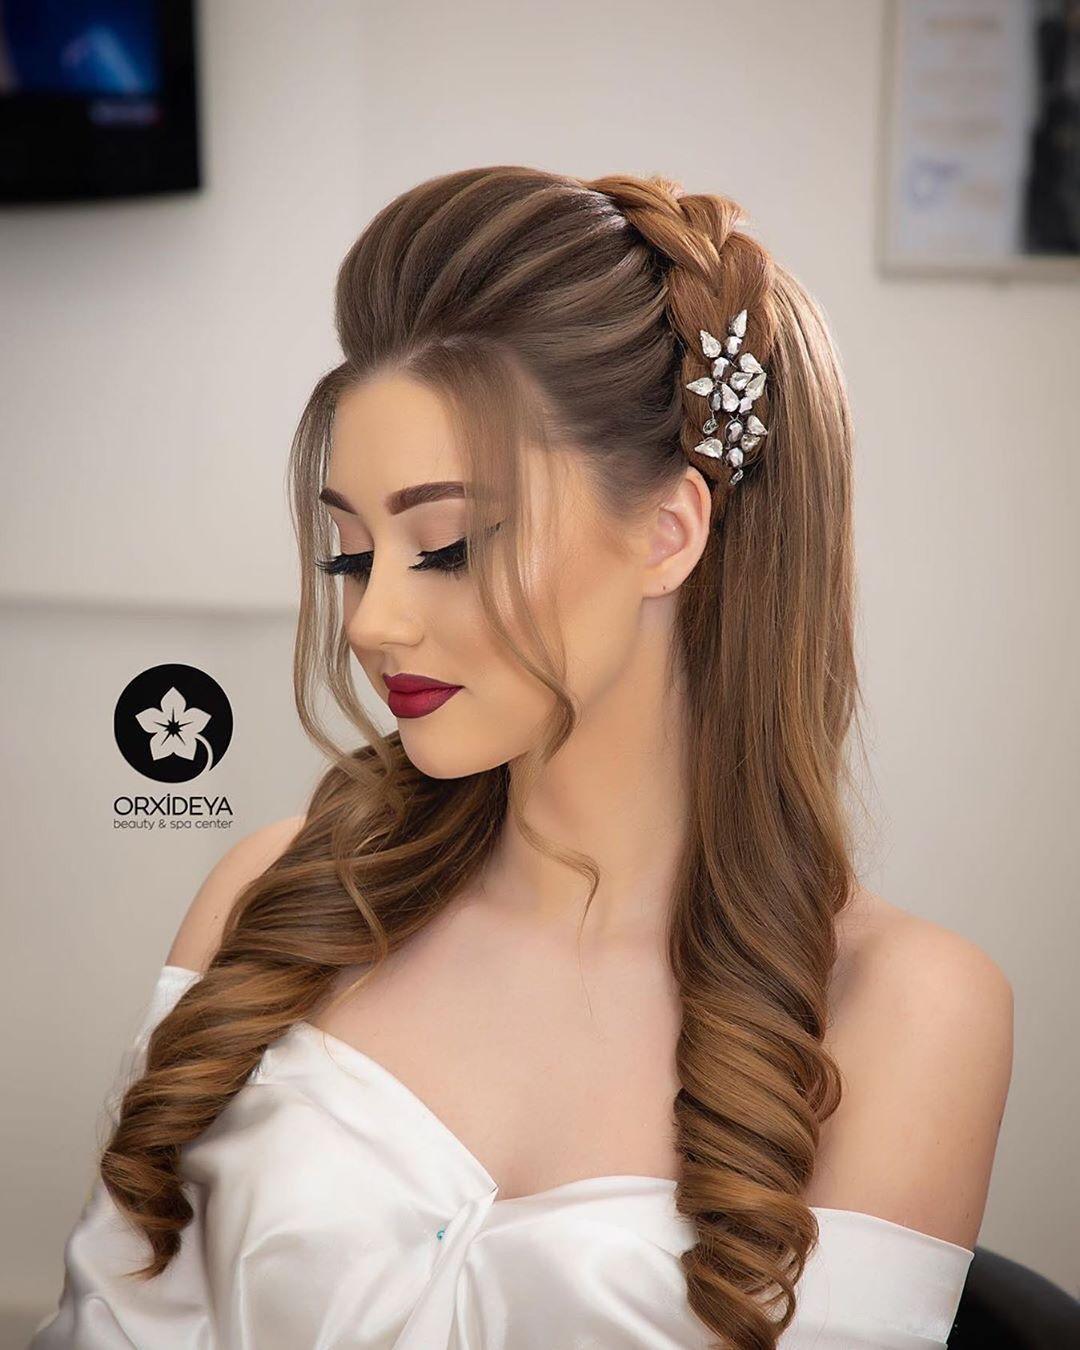 385 Likes 1 Comments Gelin Sac Makiyaj Wedding Orxideyabeauty Vip On Instagram Sac Duzumu Stilist Front Hair Styles Bridal Hair Buns Hair Styles